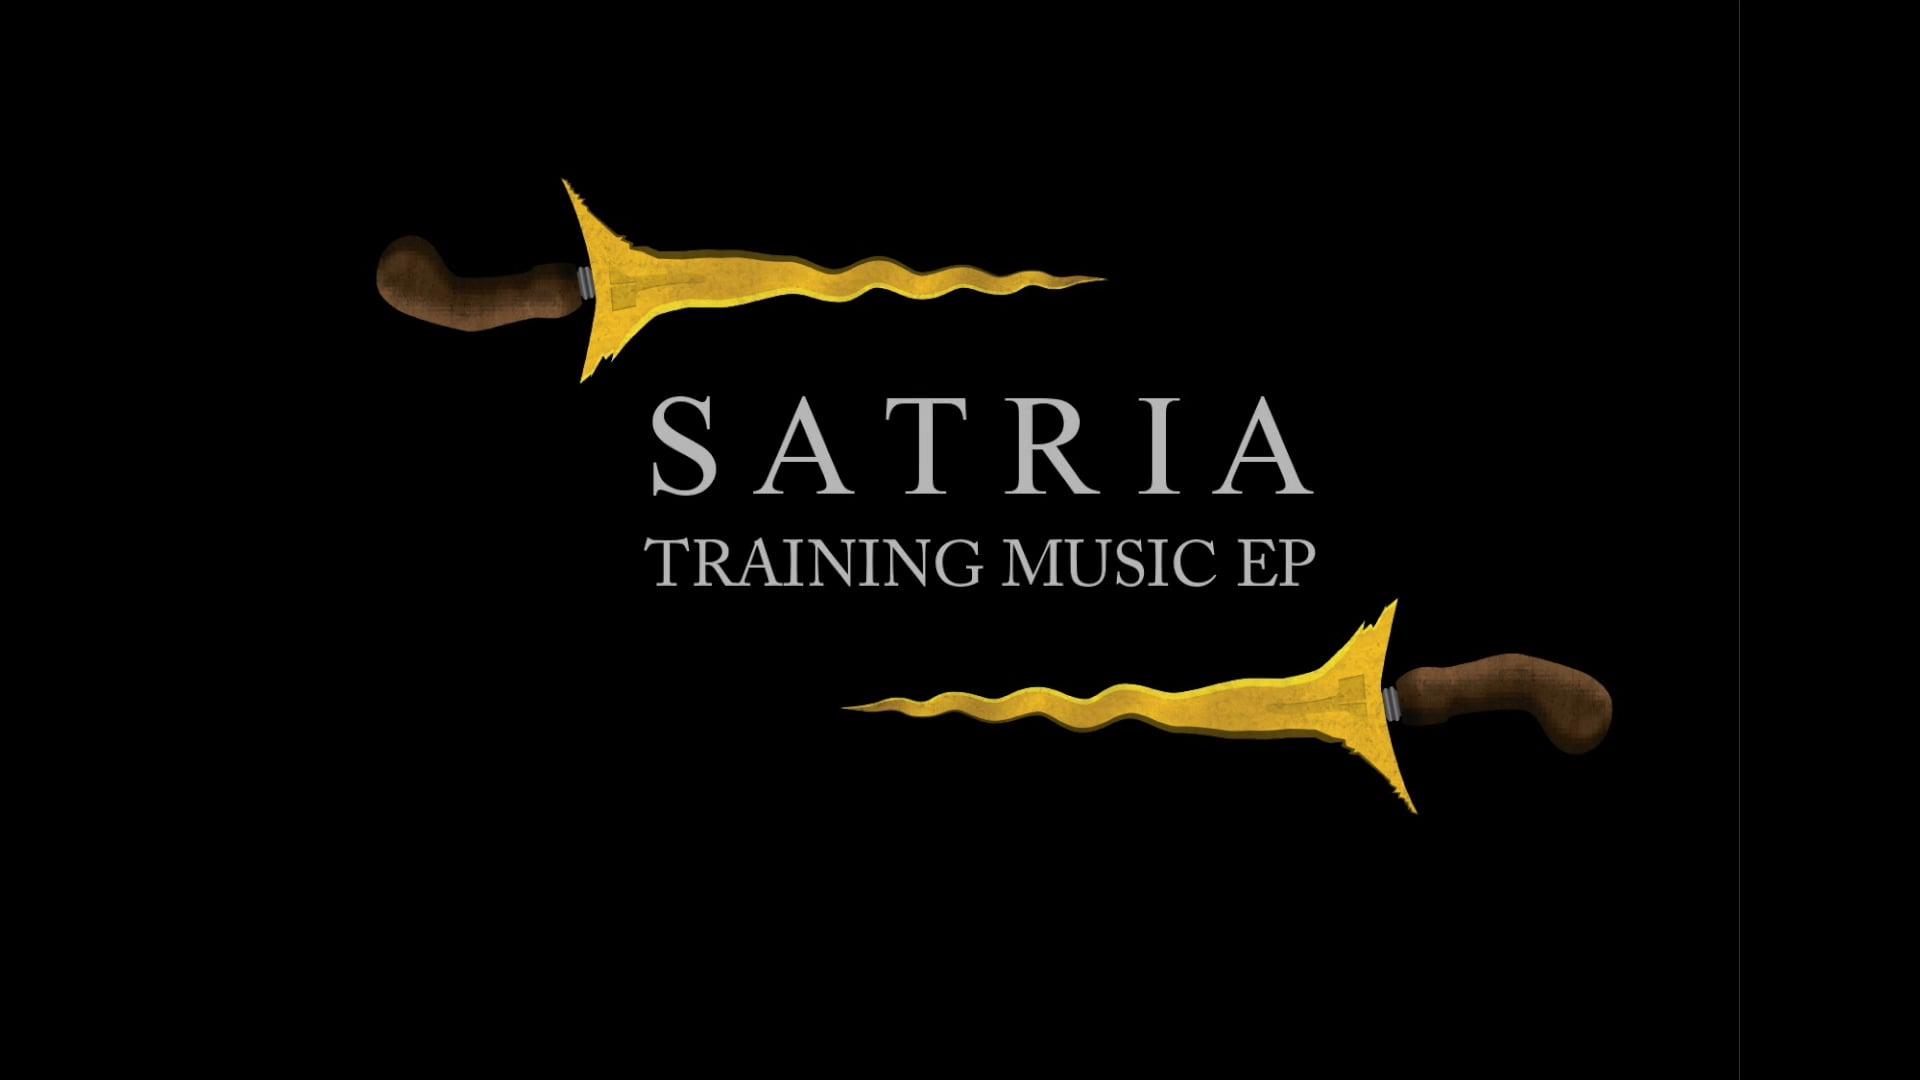 SATRIA TRAINING MUSIC SAMPLE